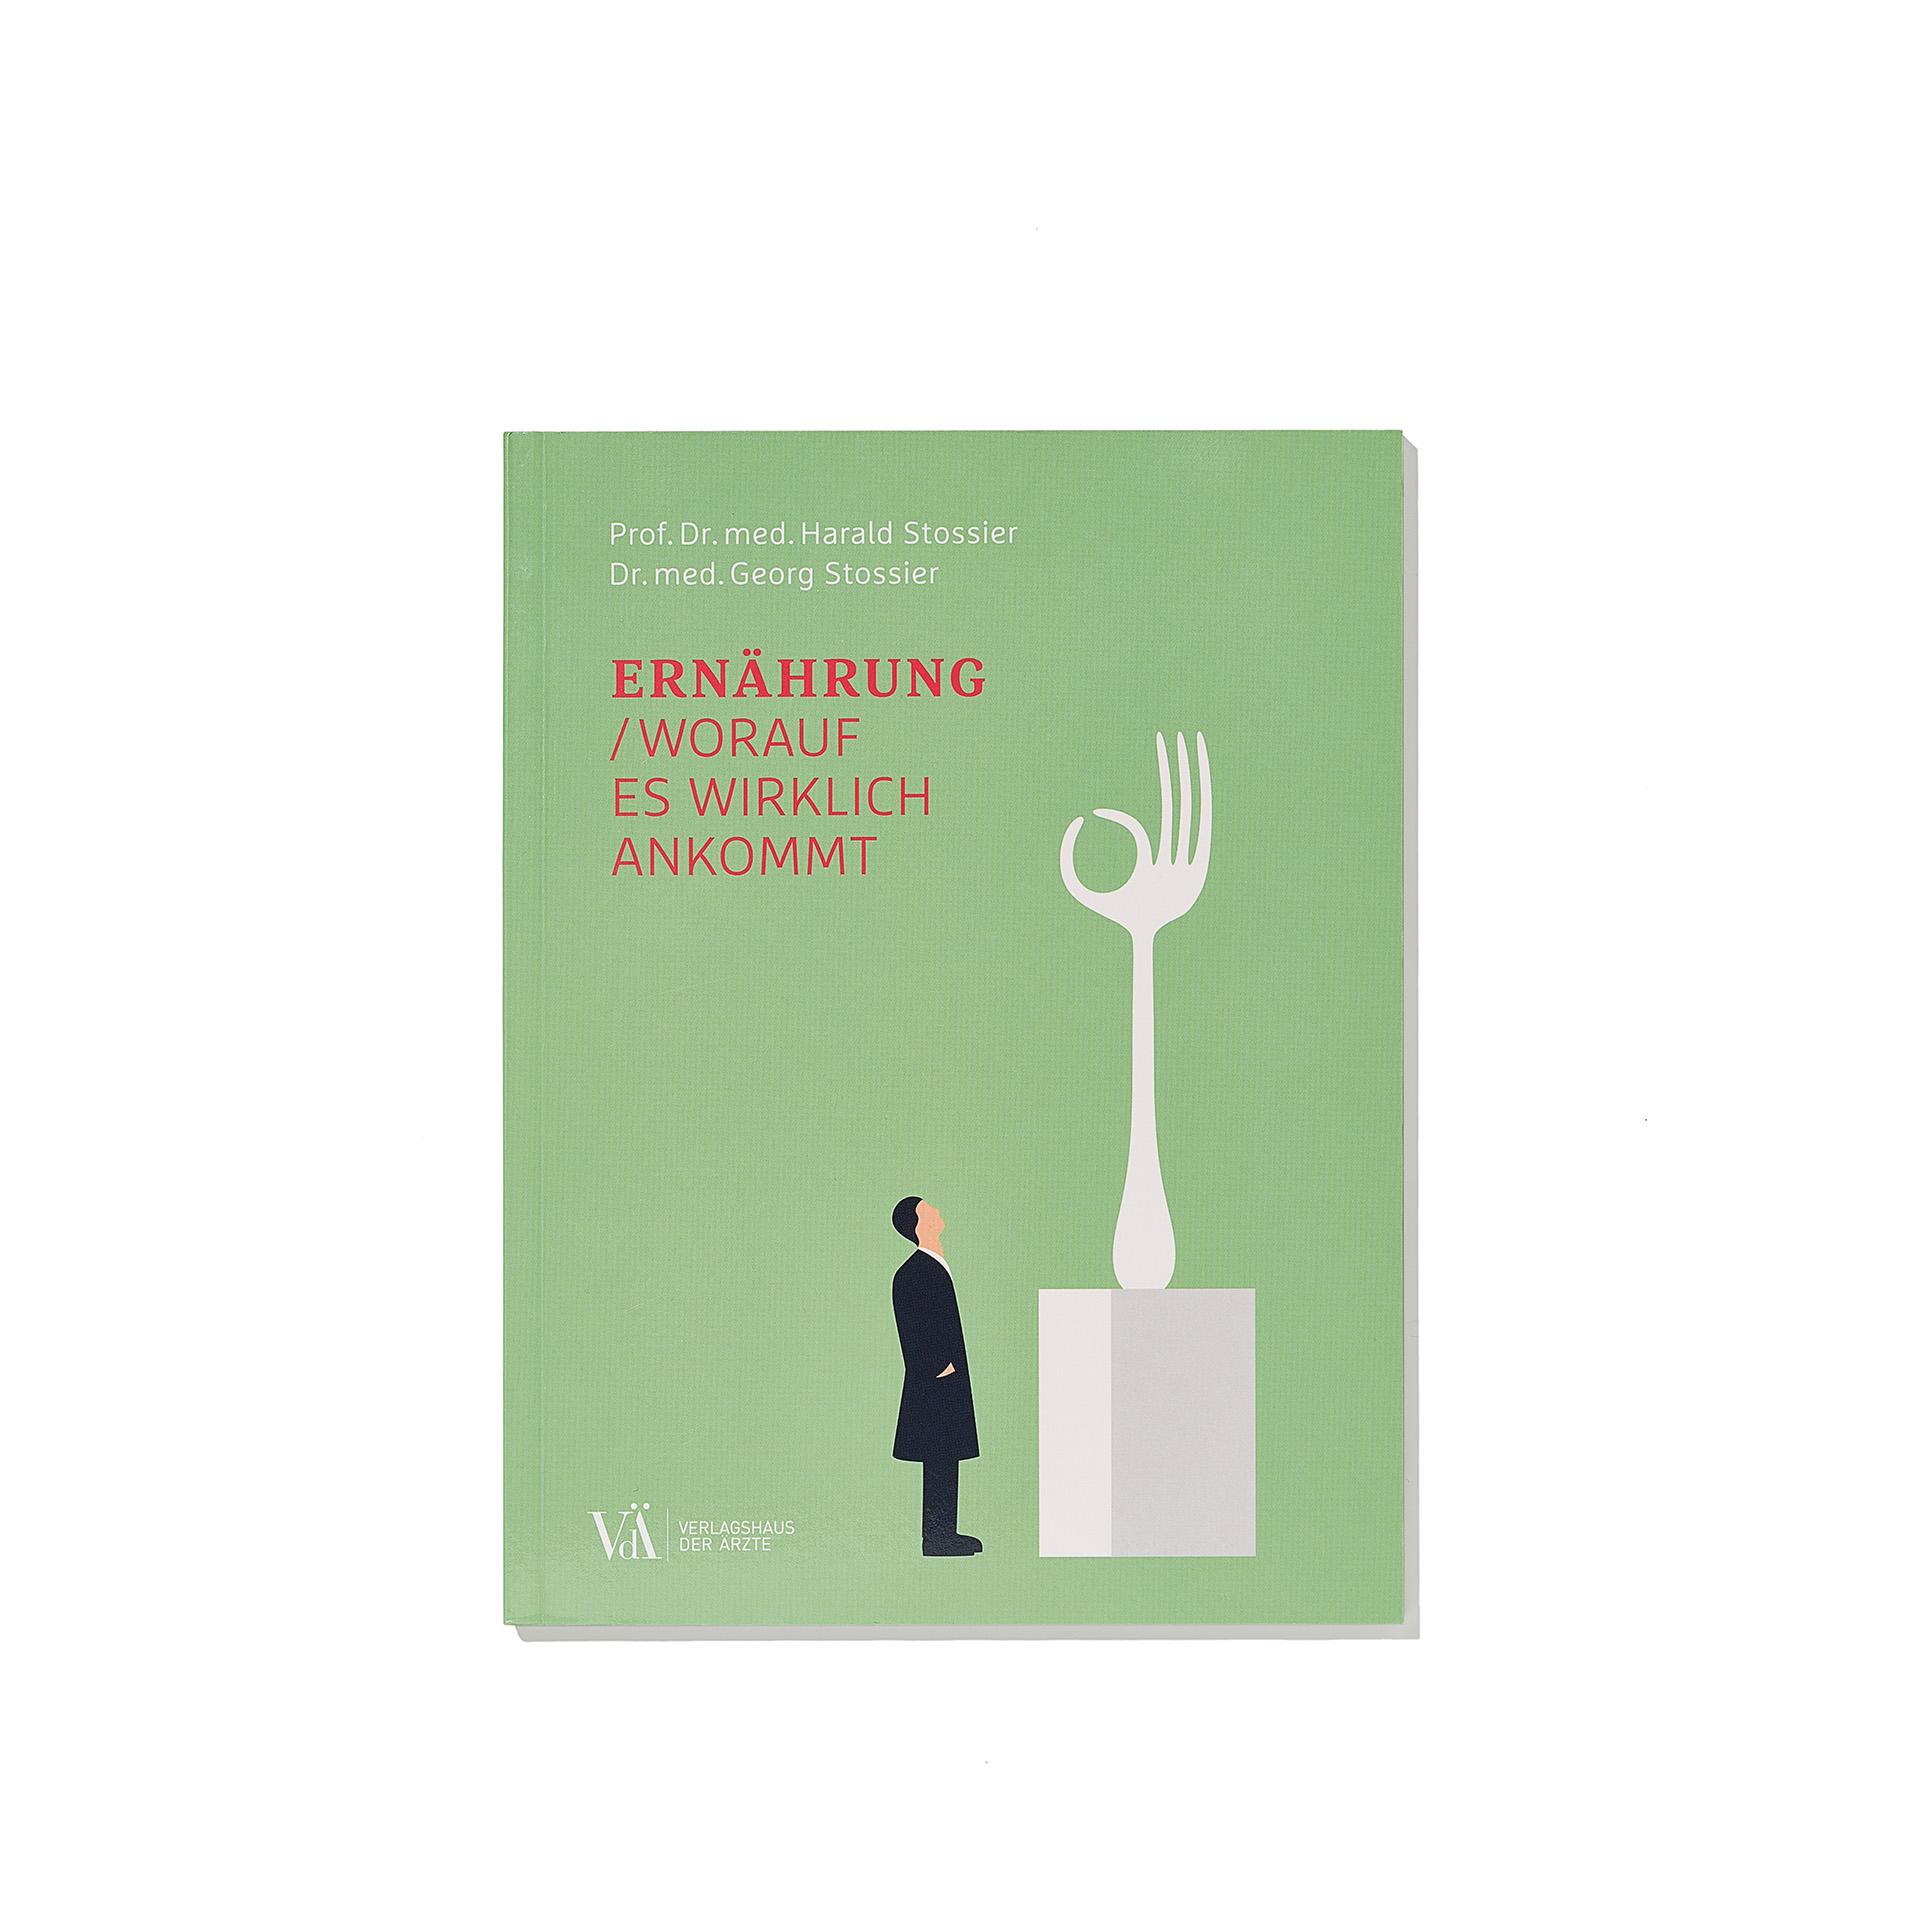 Book VIVAMAYR Ernährung DE